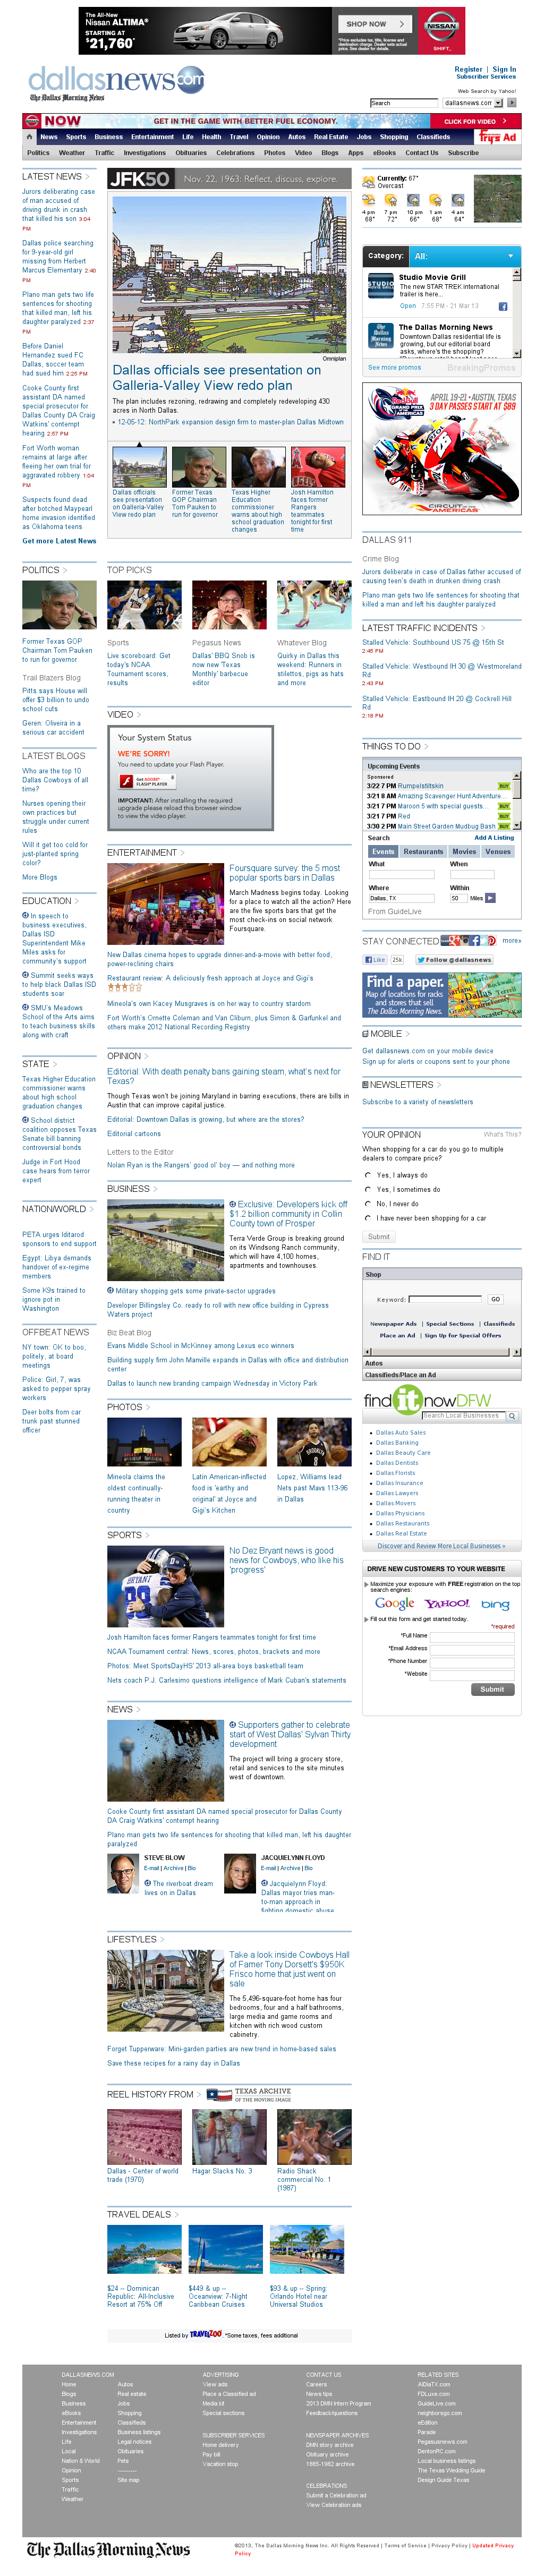 dallasnews.com at Thursday March 21, 2013, 8:04 p.m. UTC